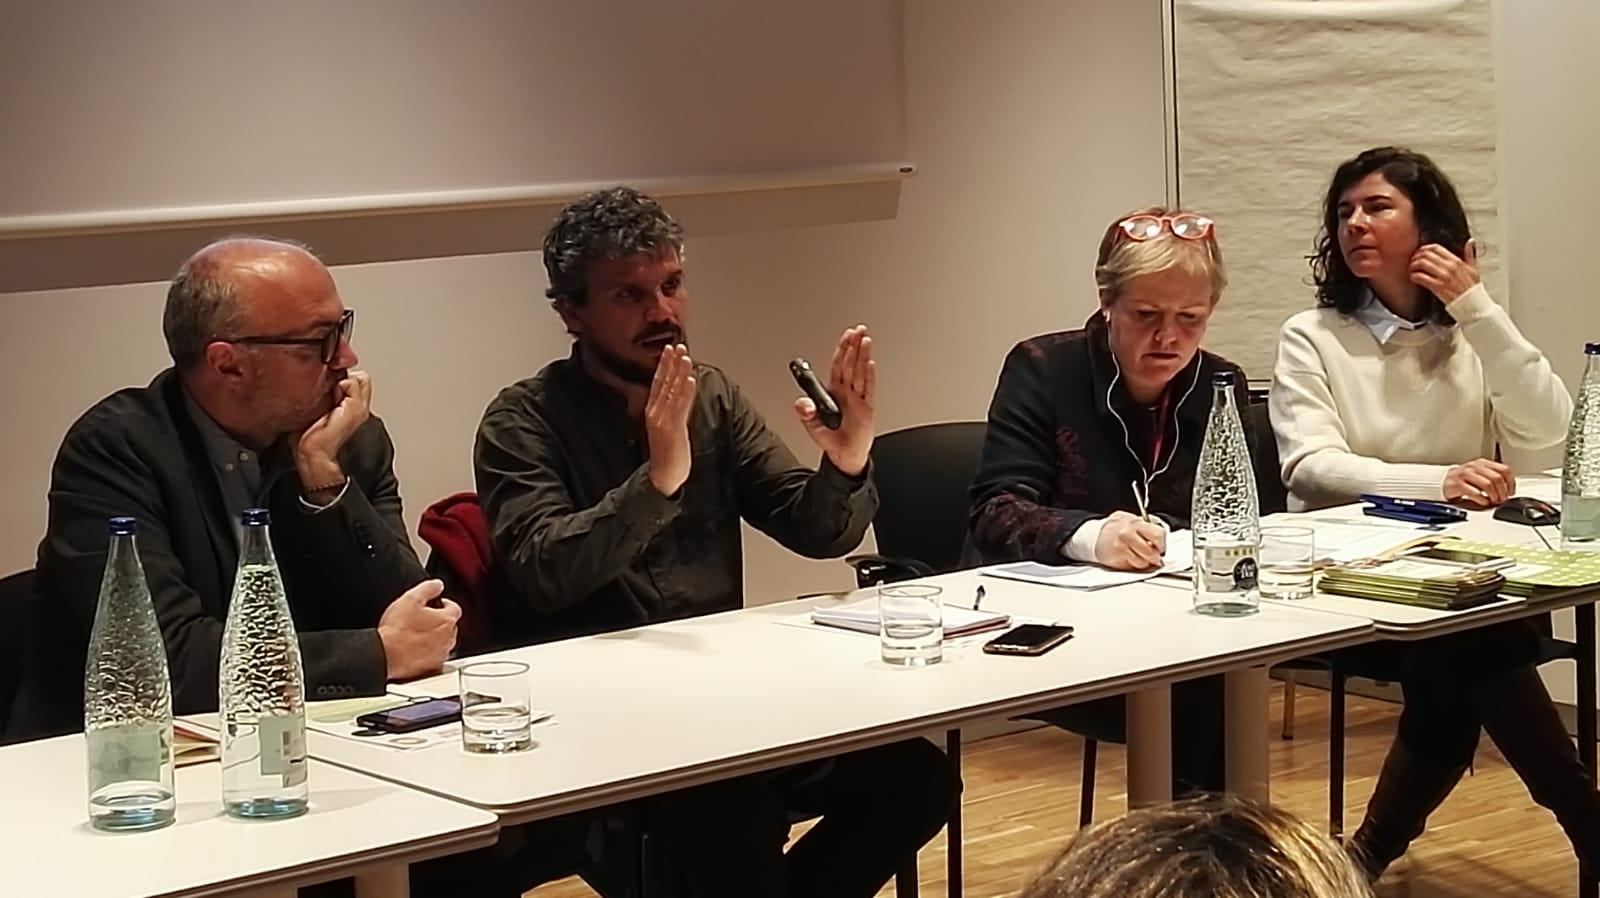 Hacia un modelo agroalimentario sostenible en Barcelona, presentado por Álvaro Porro